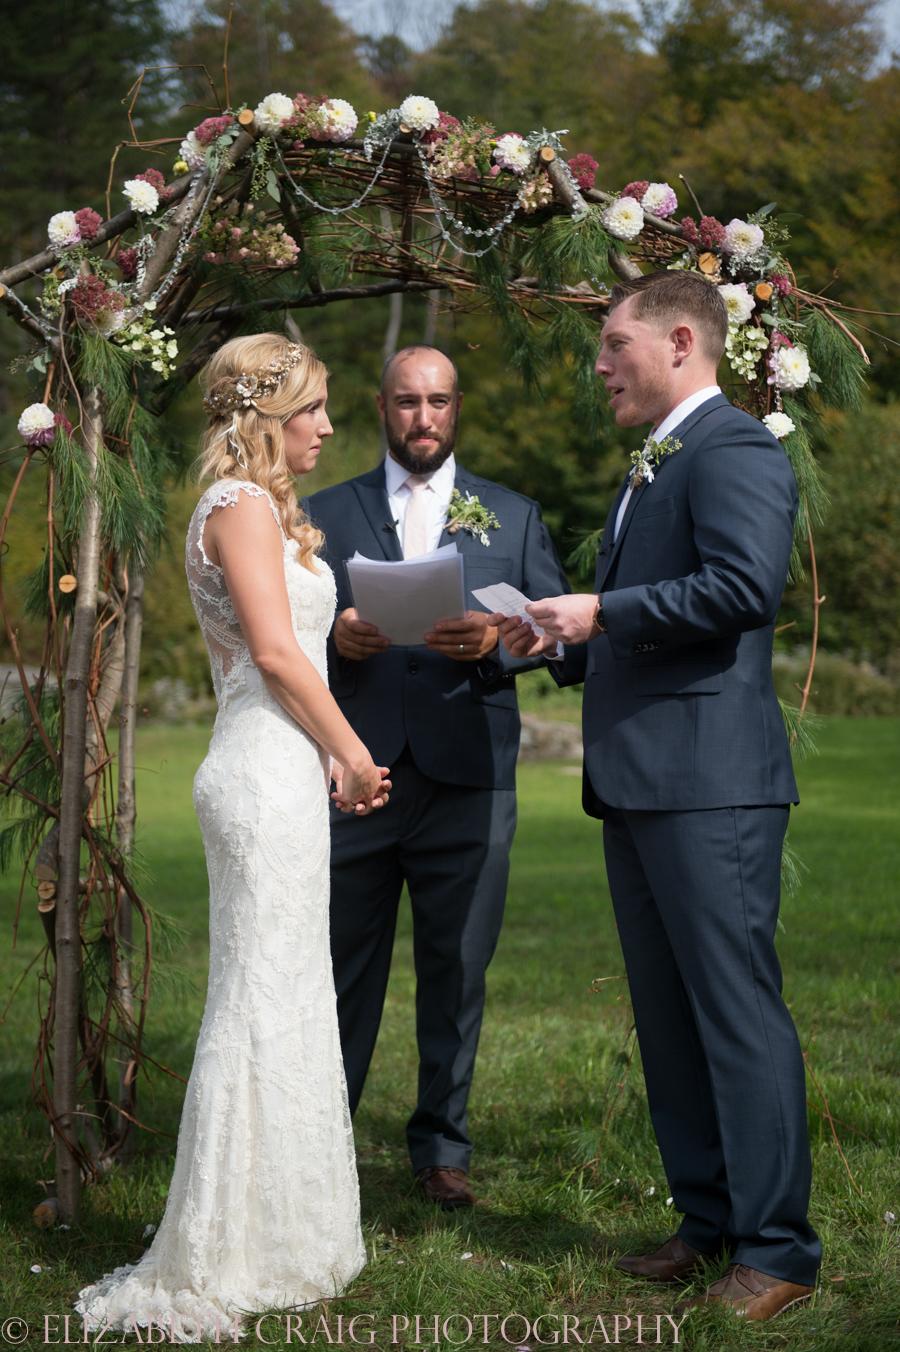 Dubois Brockway St. Marys PA Weddings-0096